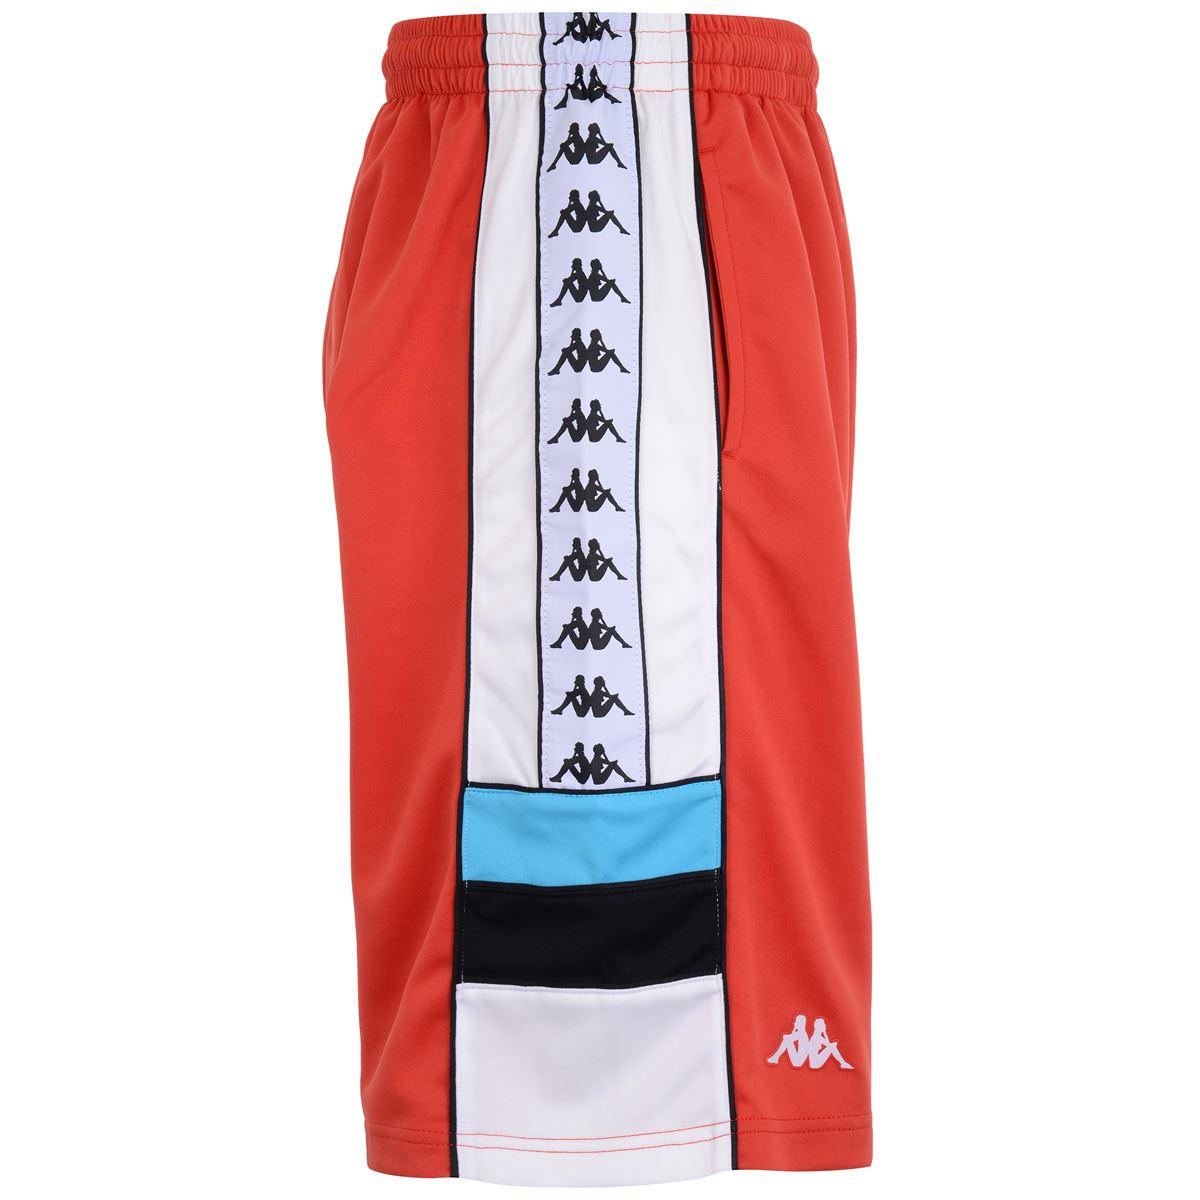 Bermuda da uomo in interlock. Kappa | Pantalone | 303WBR0A50 RED-WHITE-BLACK